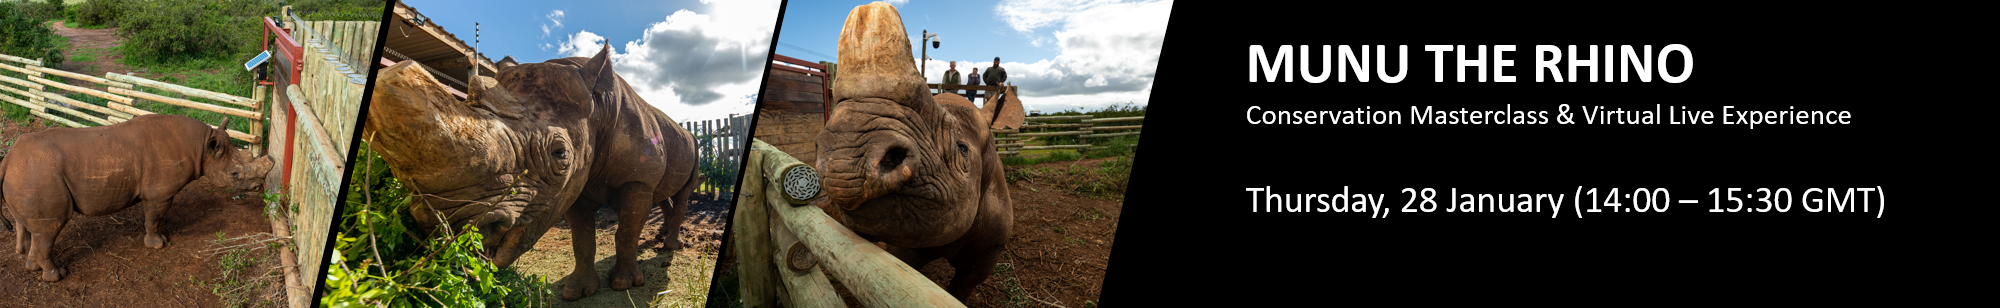 Munu the Rhino - Conservation Masterclass